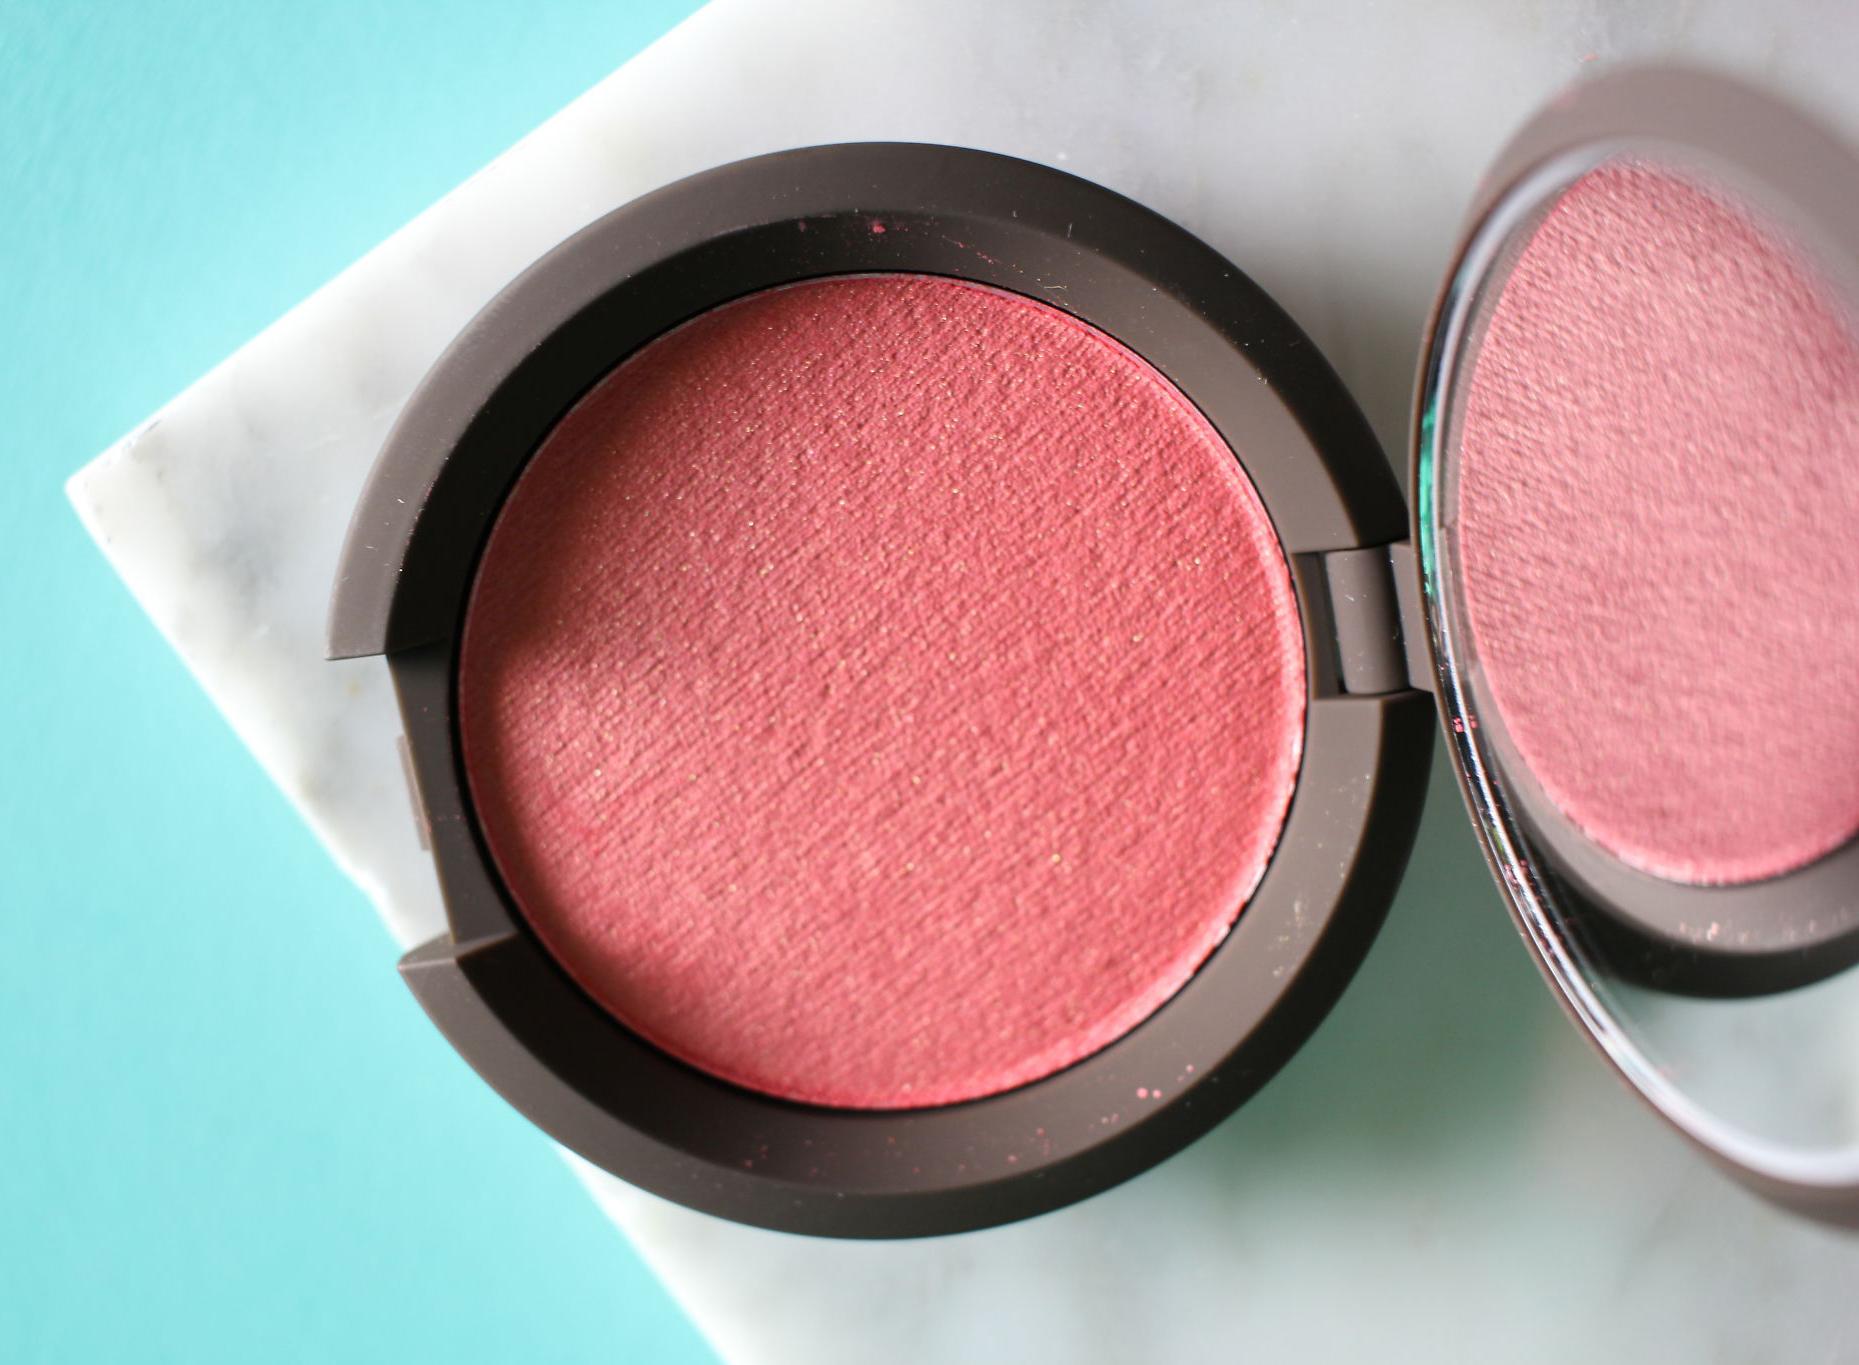 Becca Skin Perfector Luminous Blush, Snapdragon